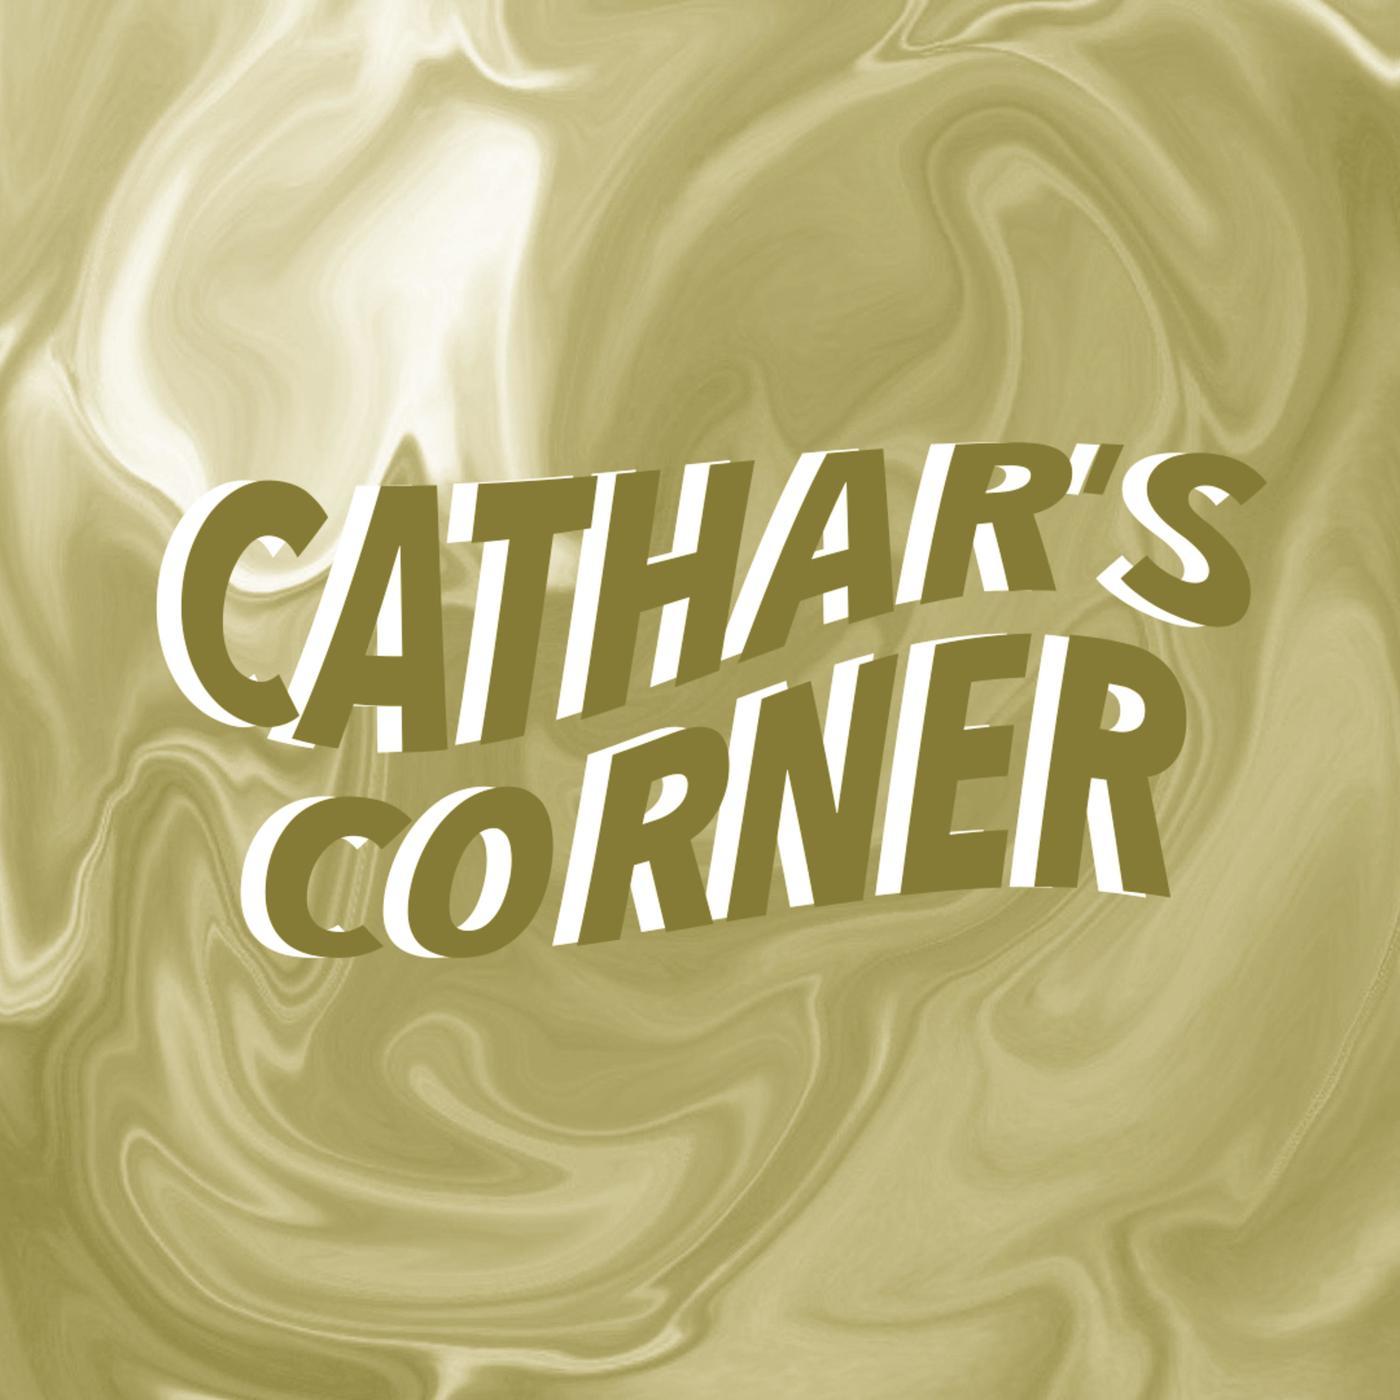 Hey Listen Cathat